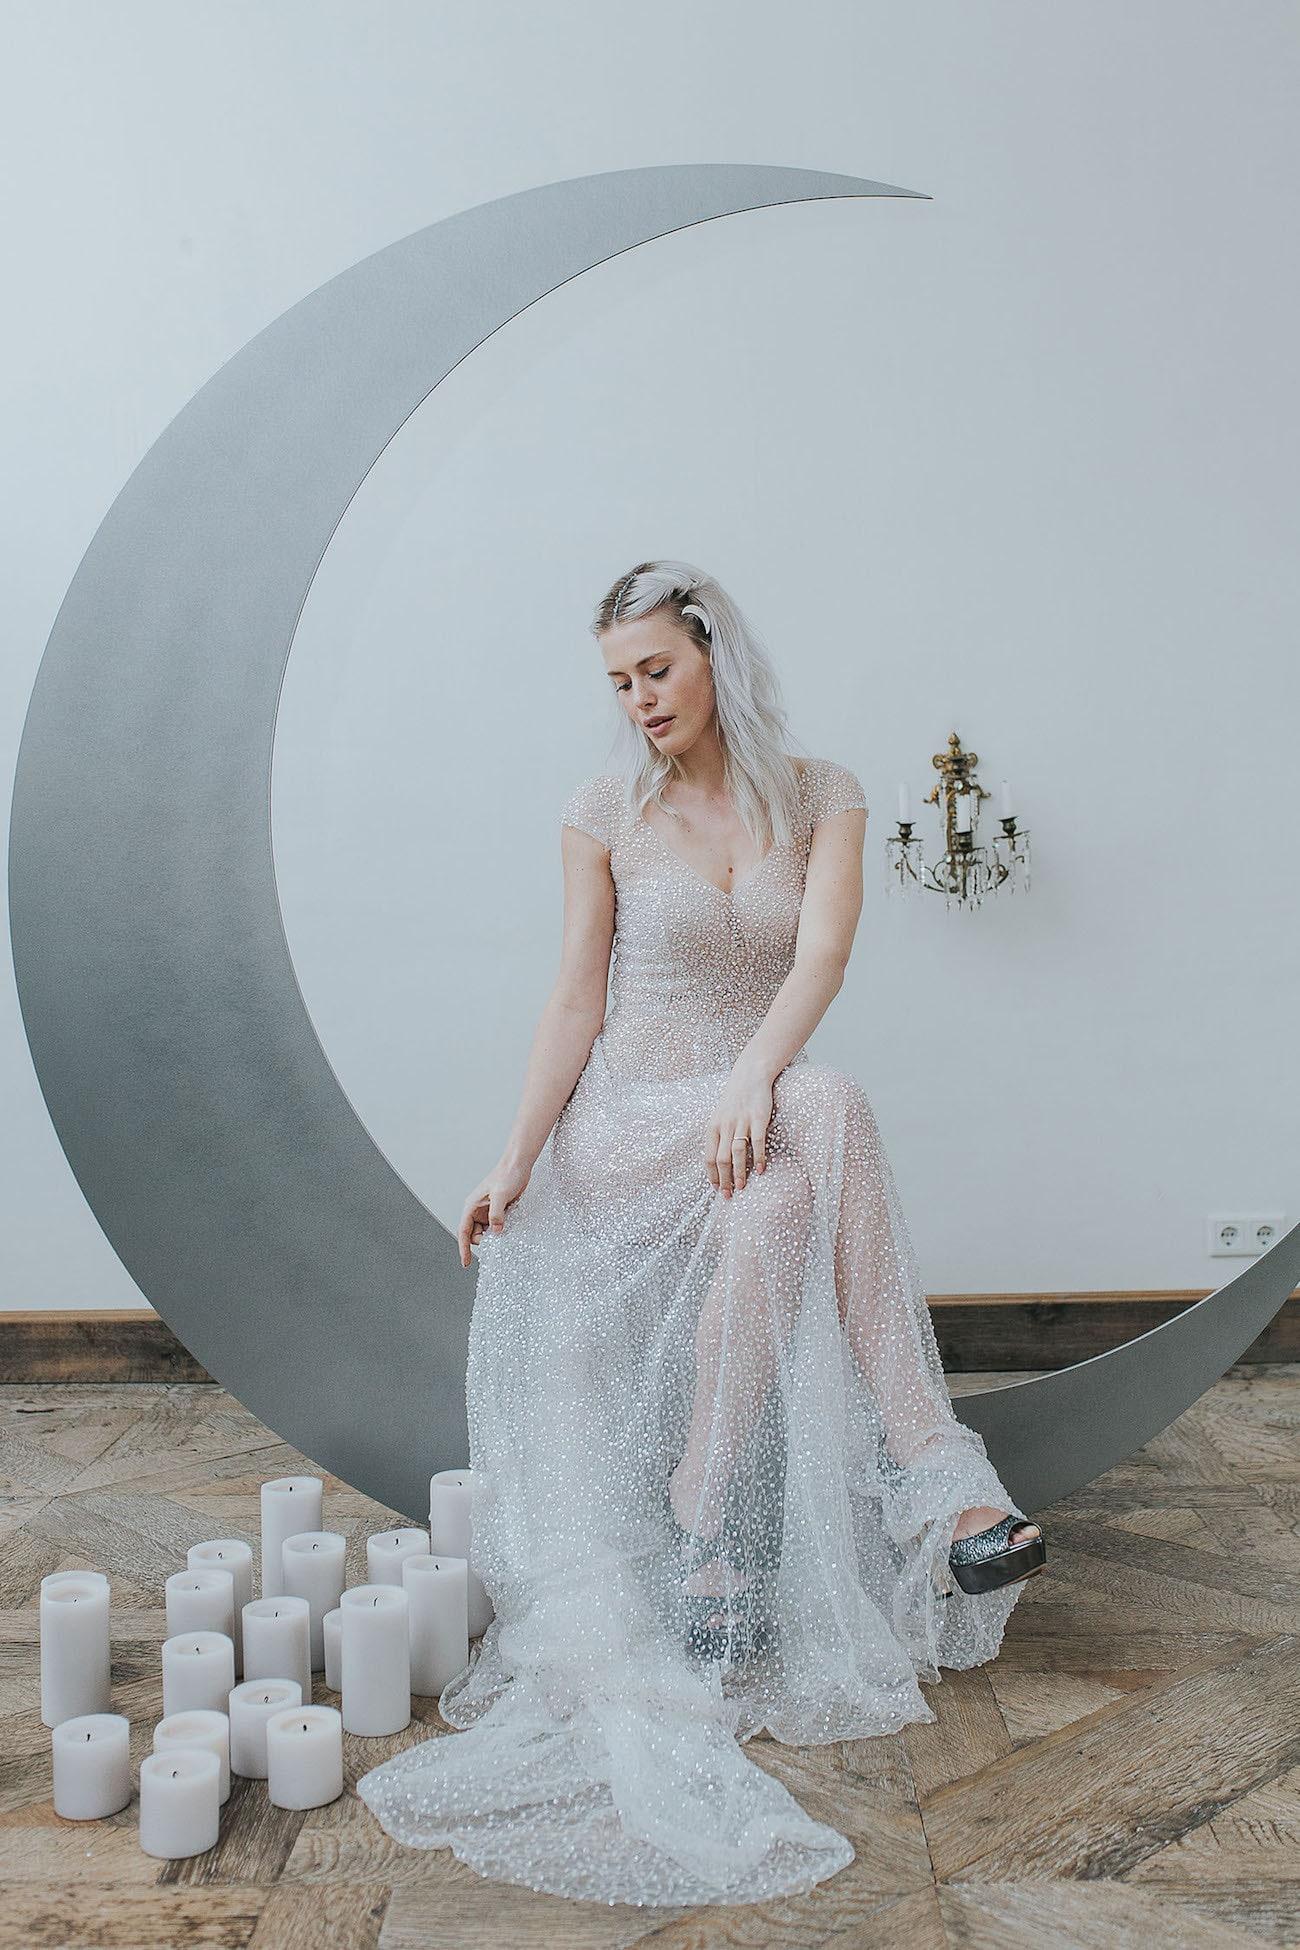 Celestial Romance Wedding Inspiration | Credit: Cornelia Lietz